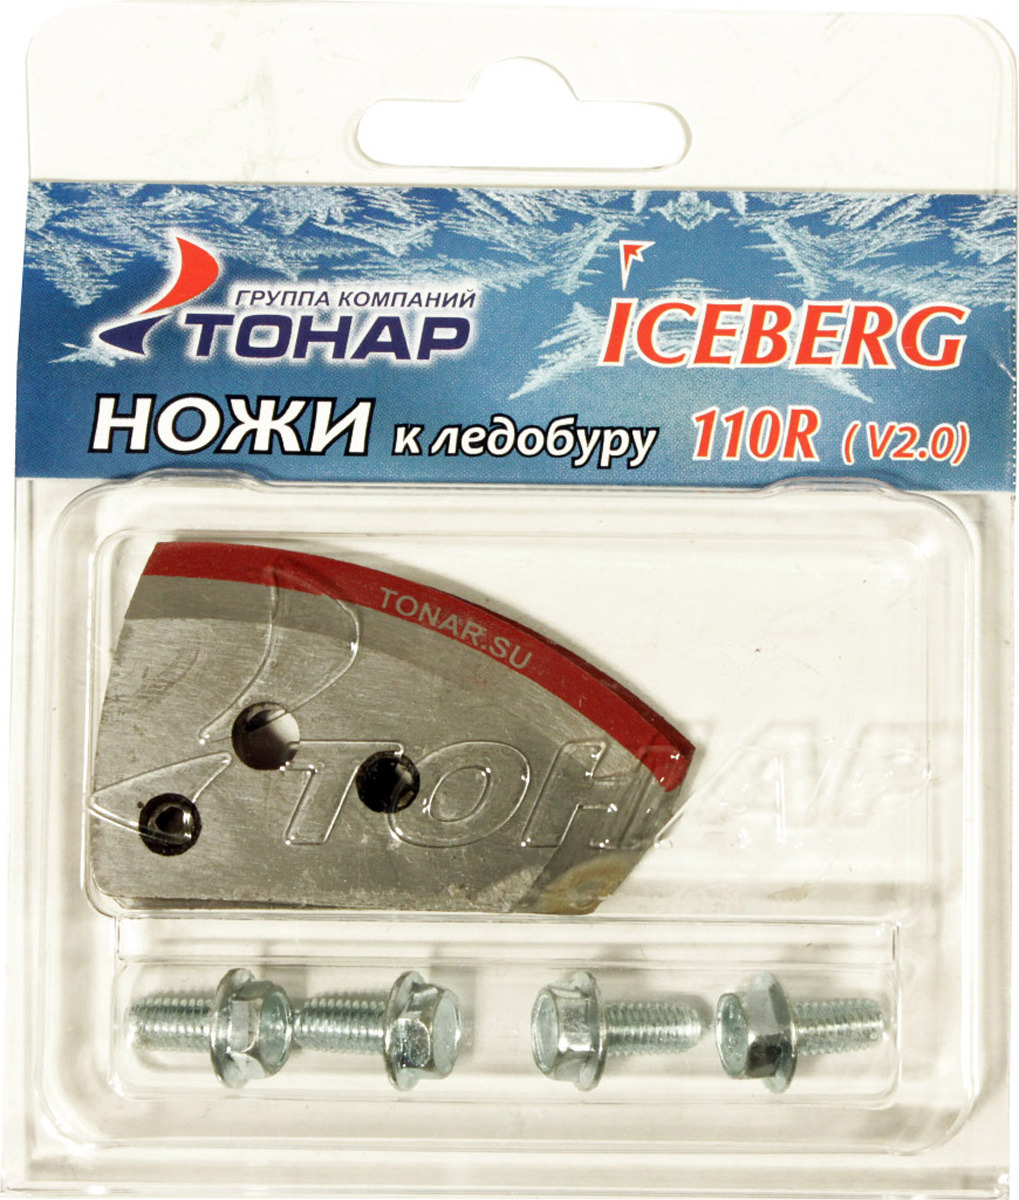 Ножи для ледобура ТОНАР Iceberg-110R V2.0, 0068191, серый металлик, диаметр 11 см